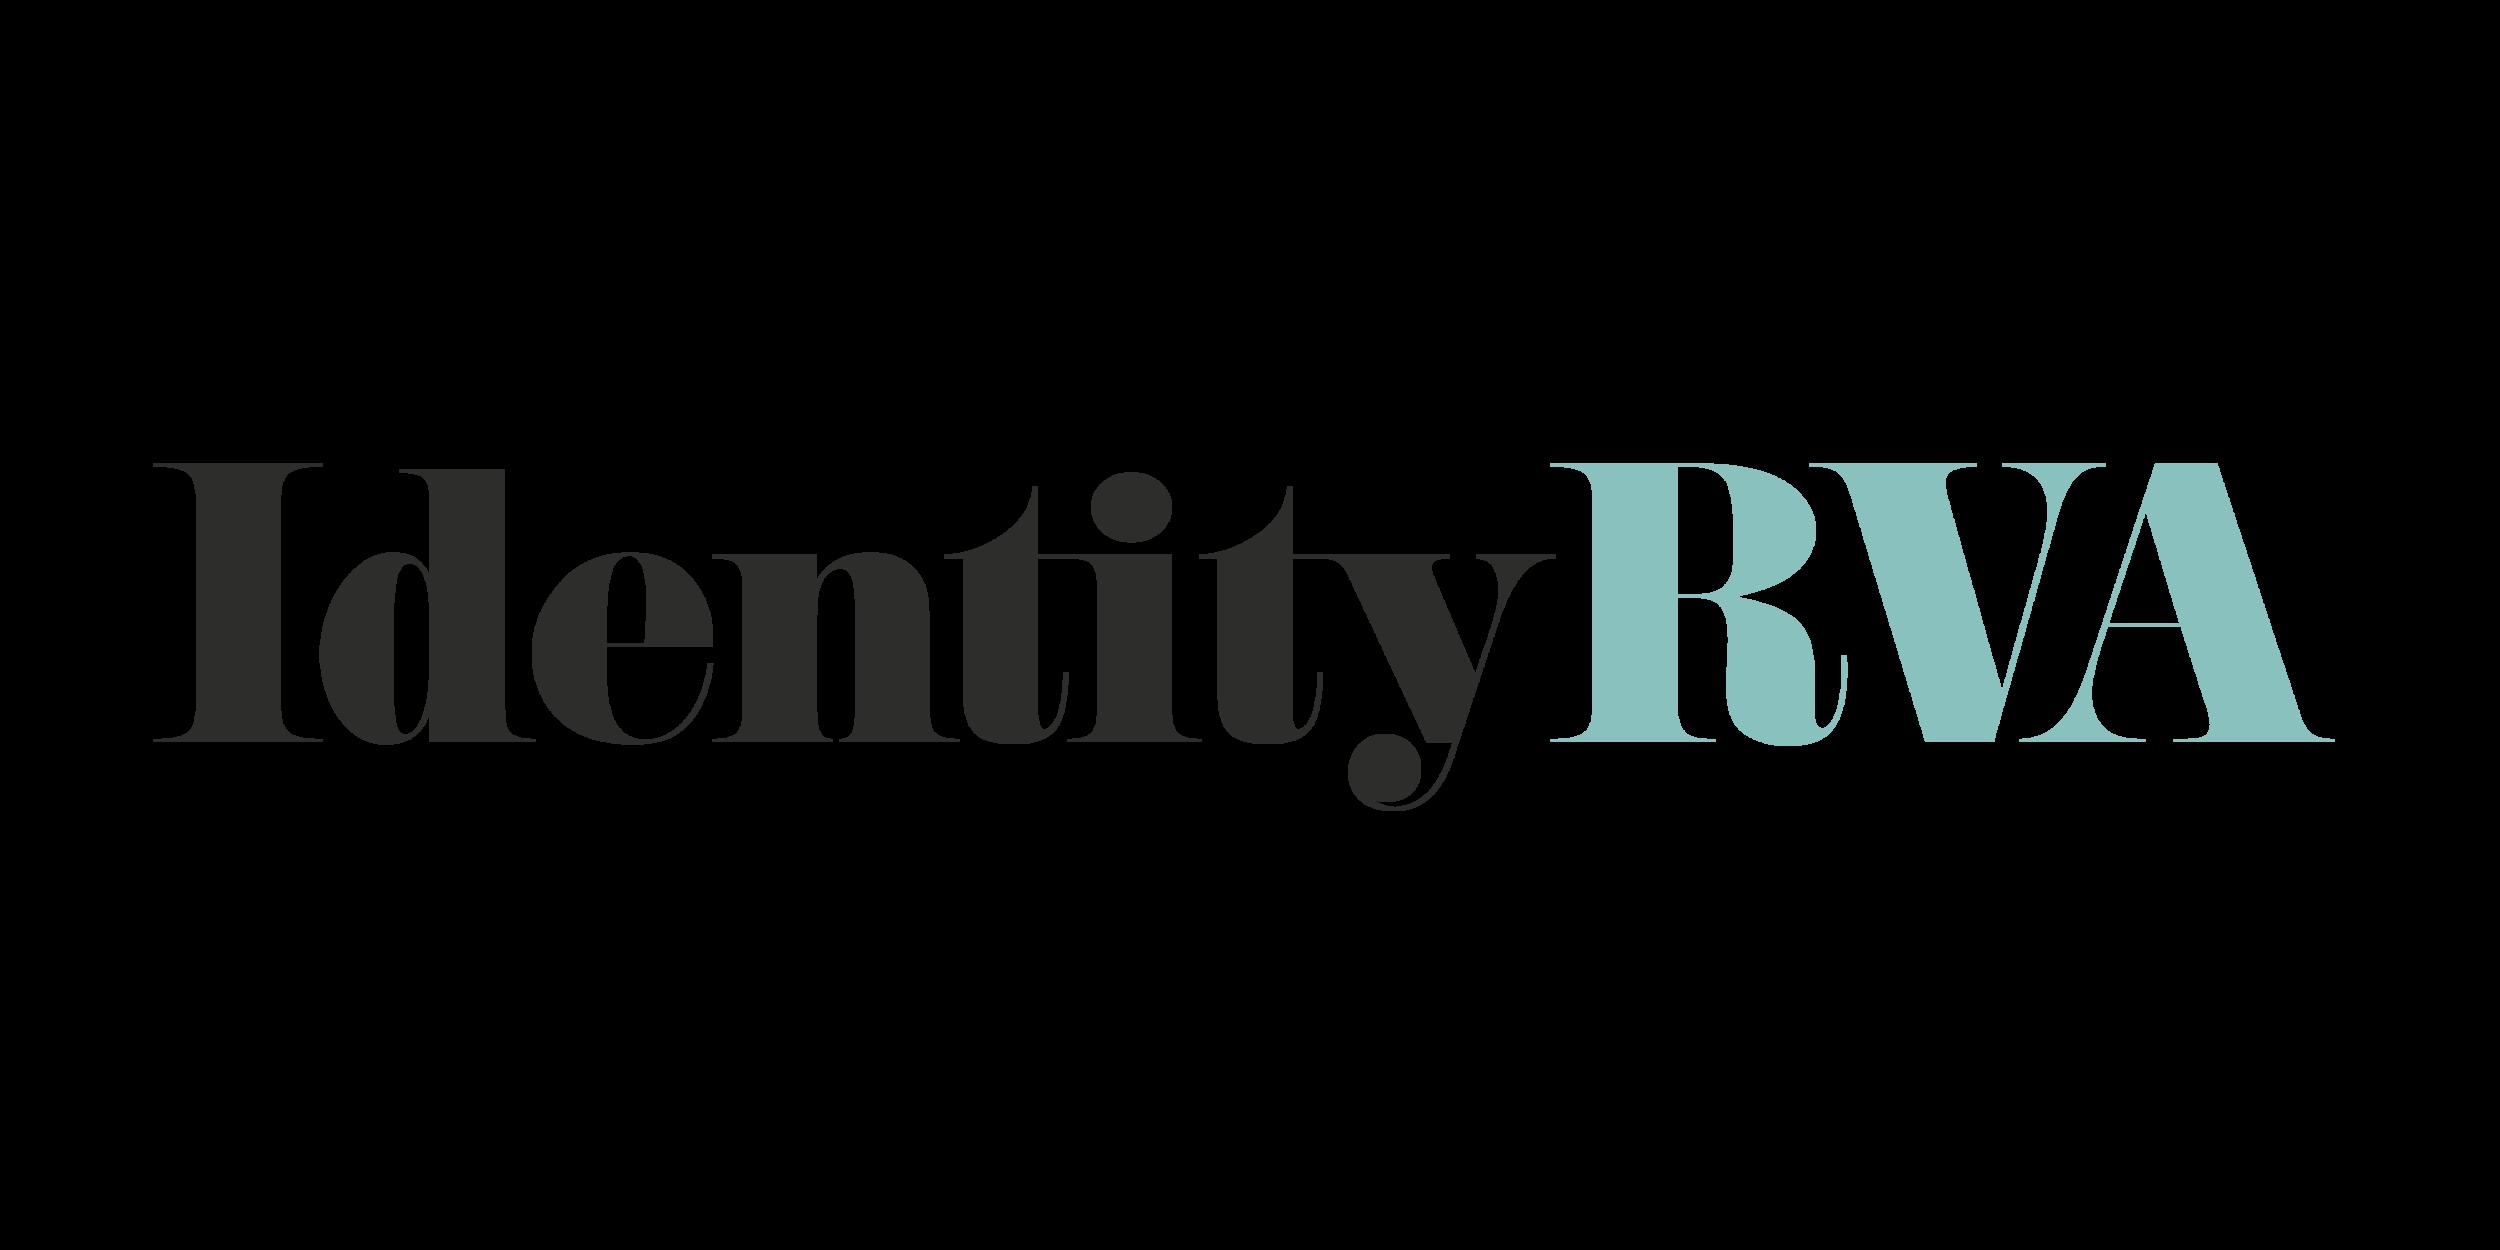 IdentityRVA - Main.png